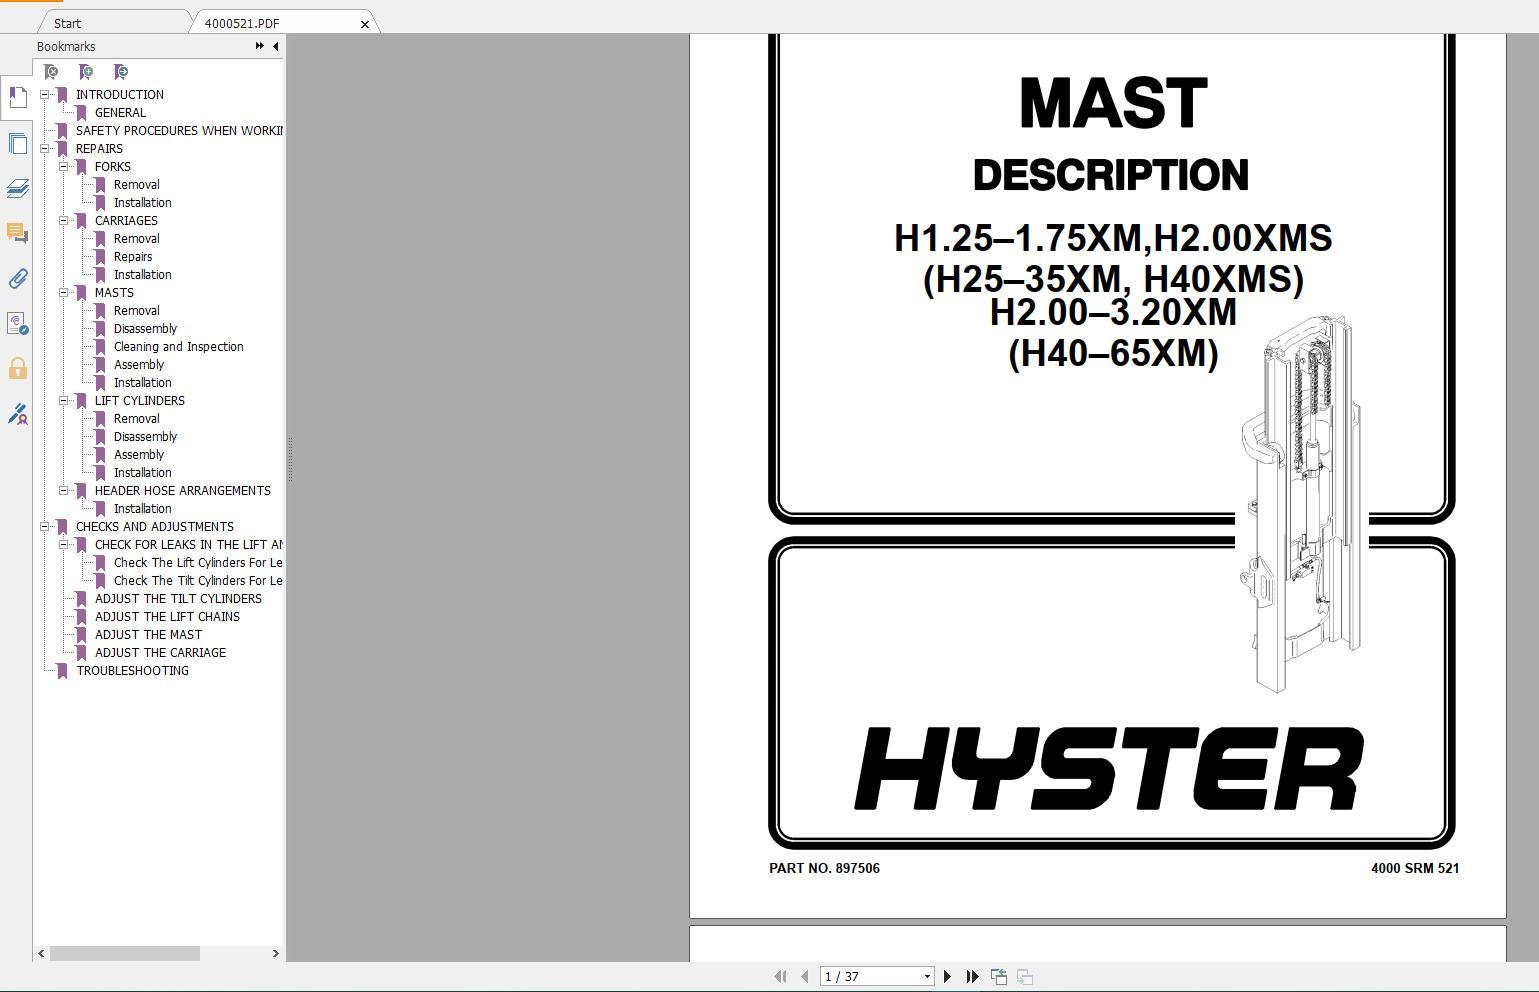 Hyster_Forklift_Class_5_Internal_Combustion_Engine_Trucks_Repair_Manuals12